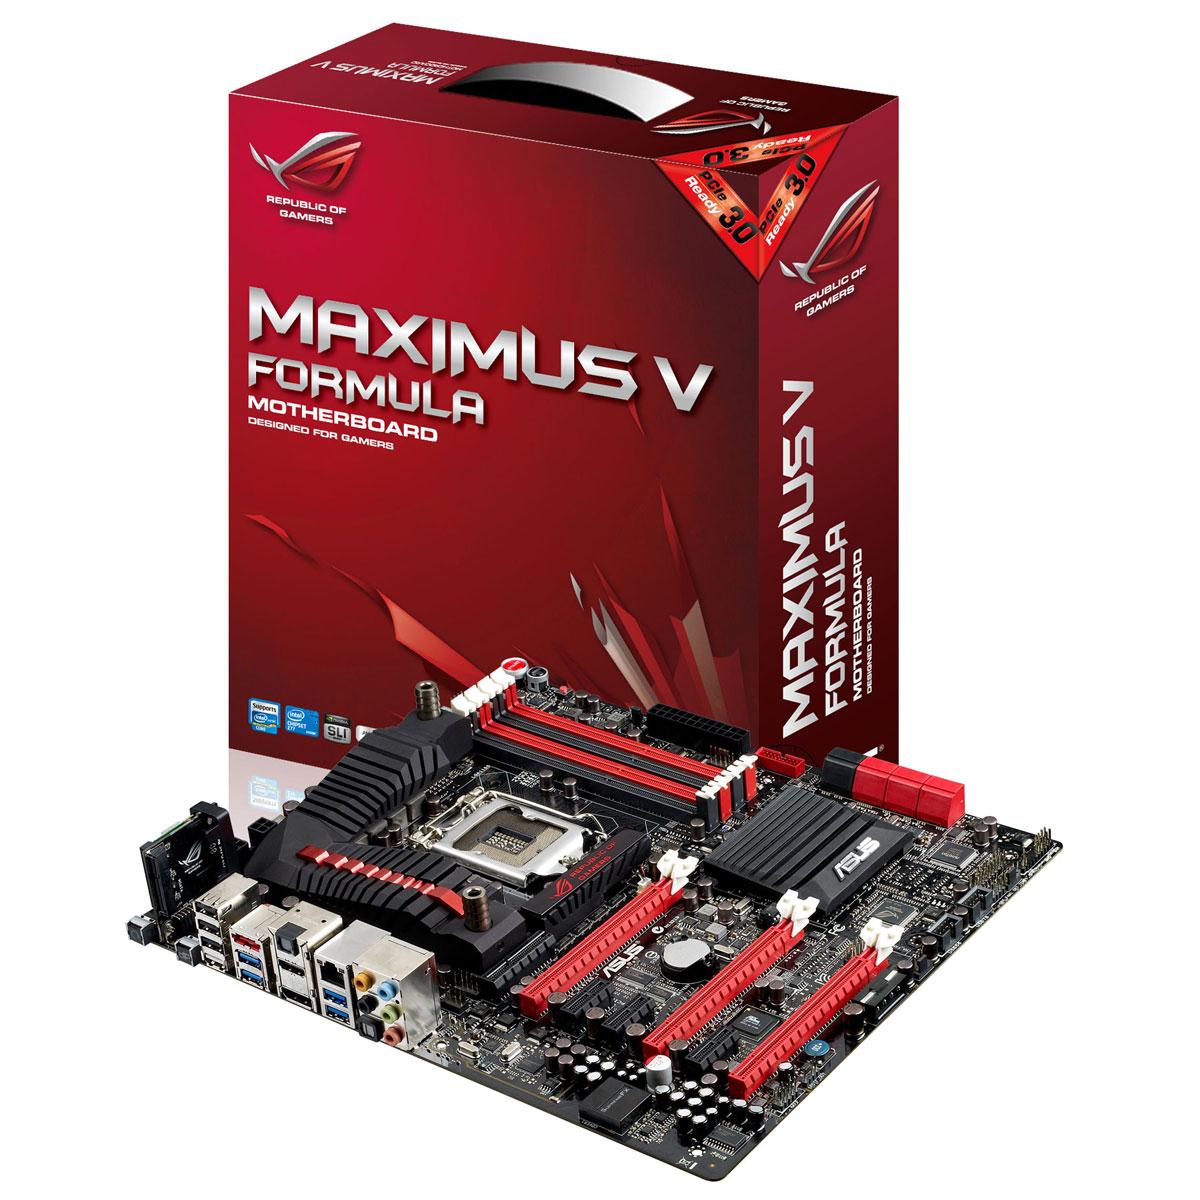 Carte mère ASUS Maximus V Formula Carte mère E-ATX Socket 1155 Intel Z77 Express - SATA 6Gb/s - USB 3.0 - 3x PCI-Express 3.0 16x